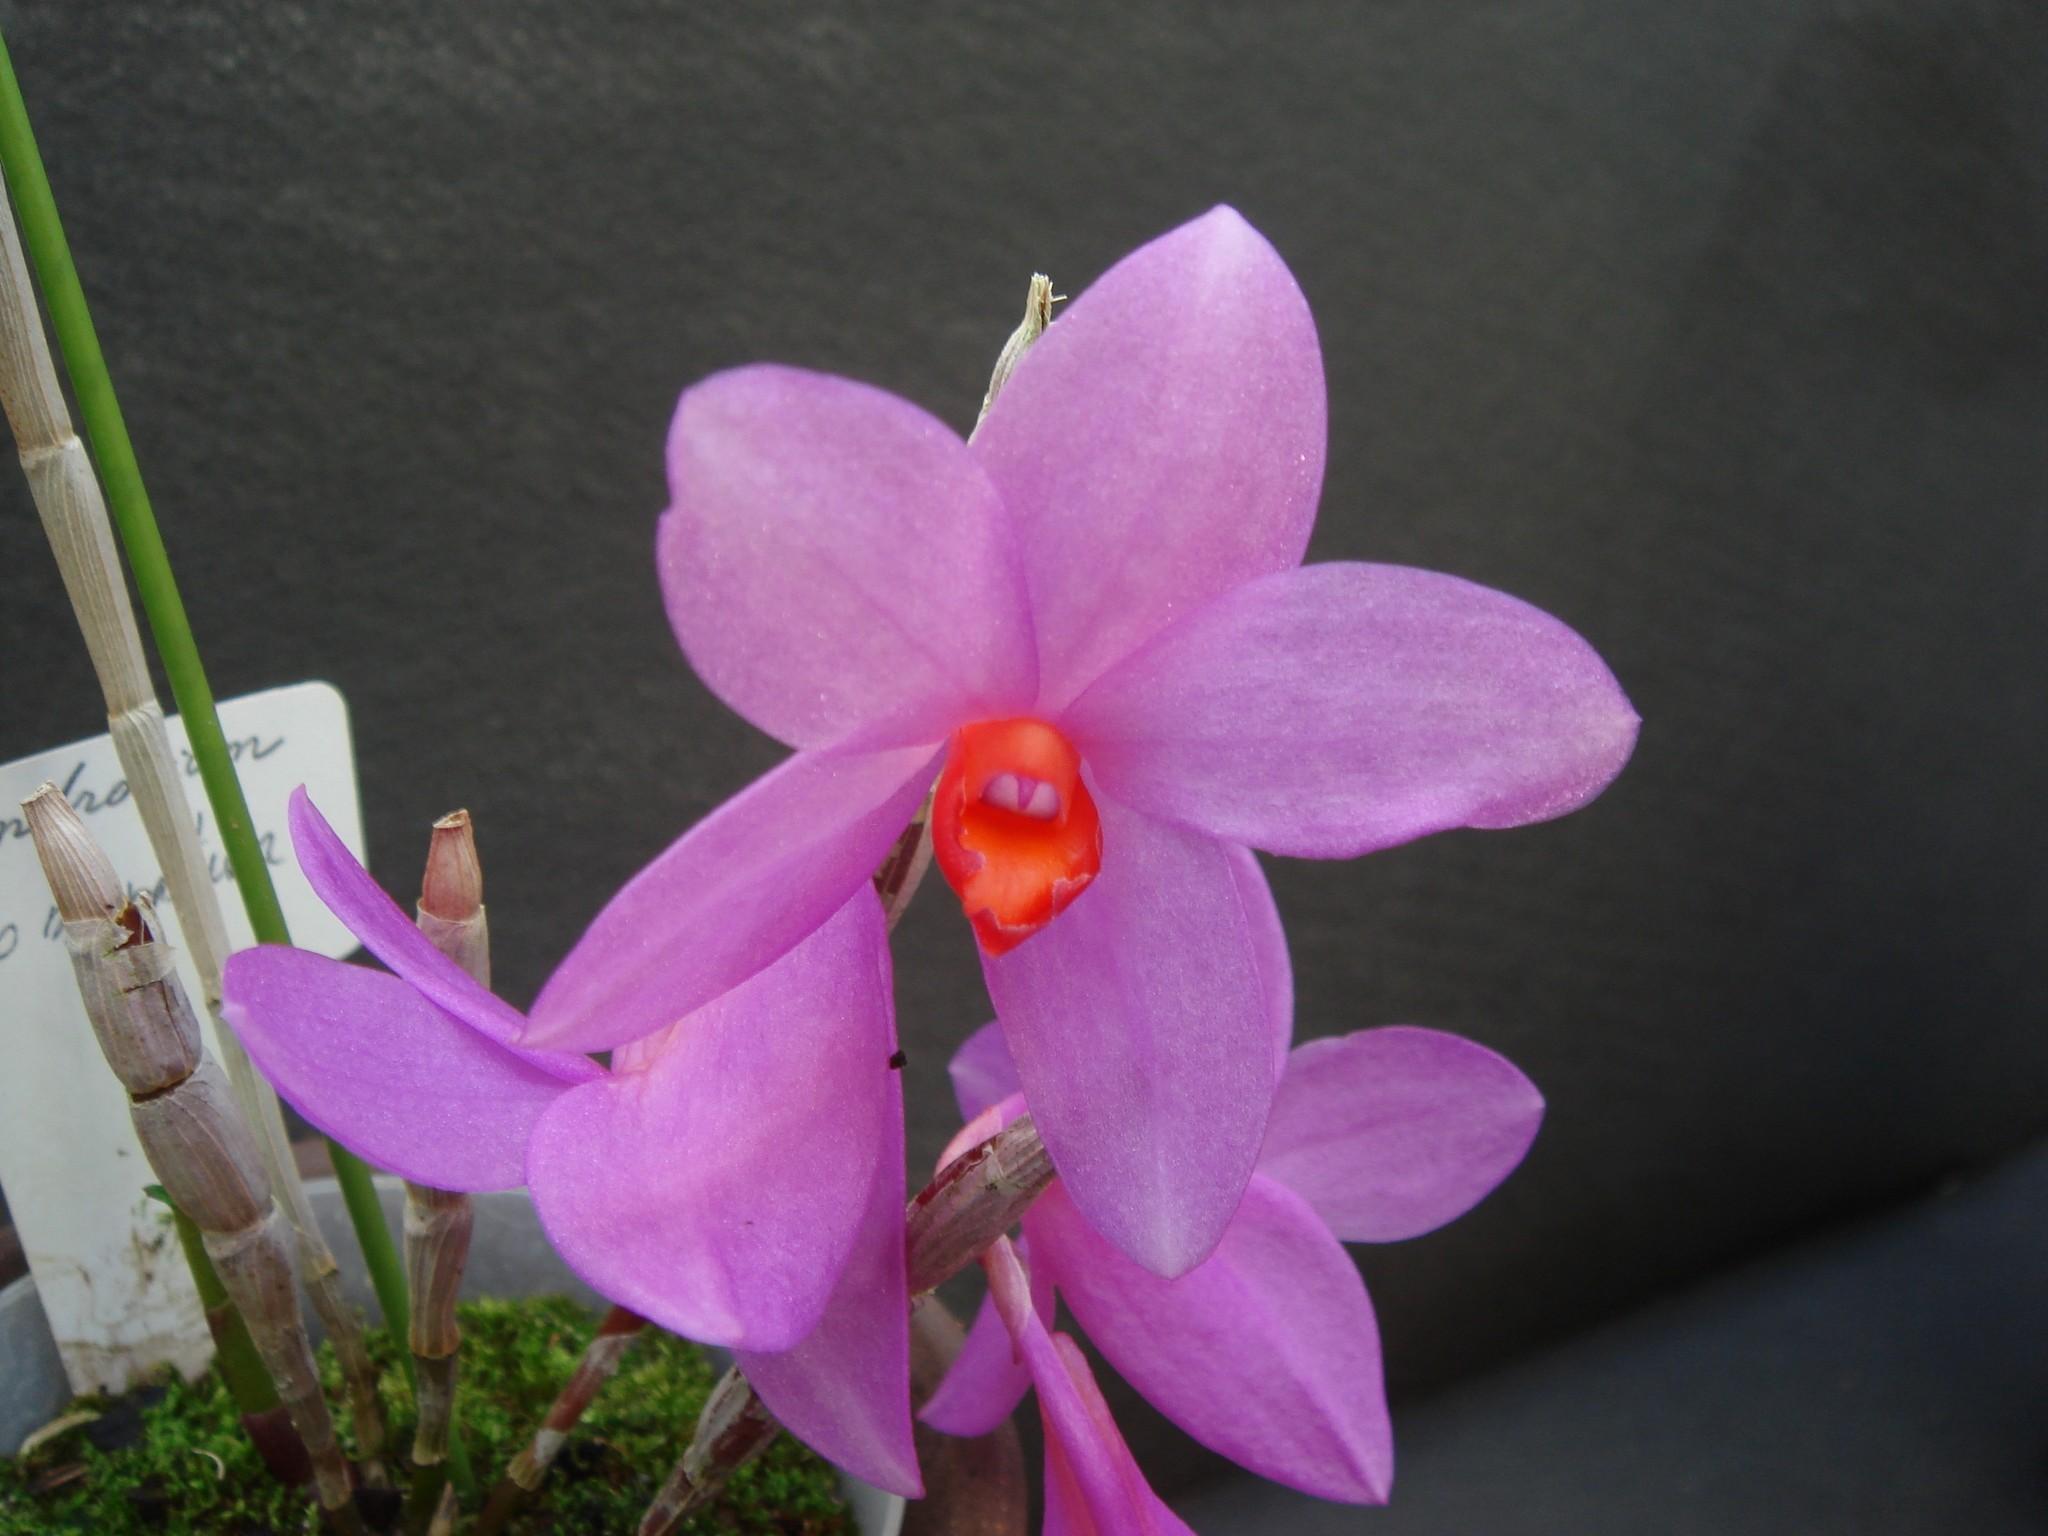 http://orchids.la.coocan.jp/Dendrobium/Dendrobium%20glomeratum/DSC08900.JPG